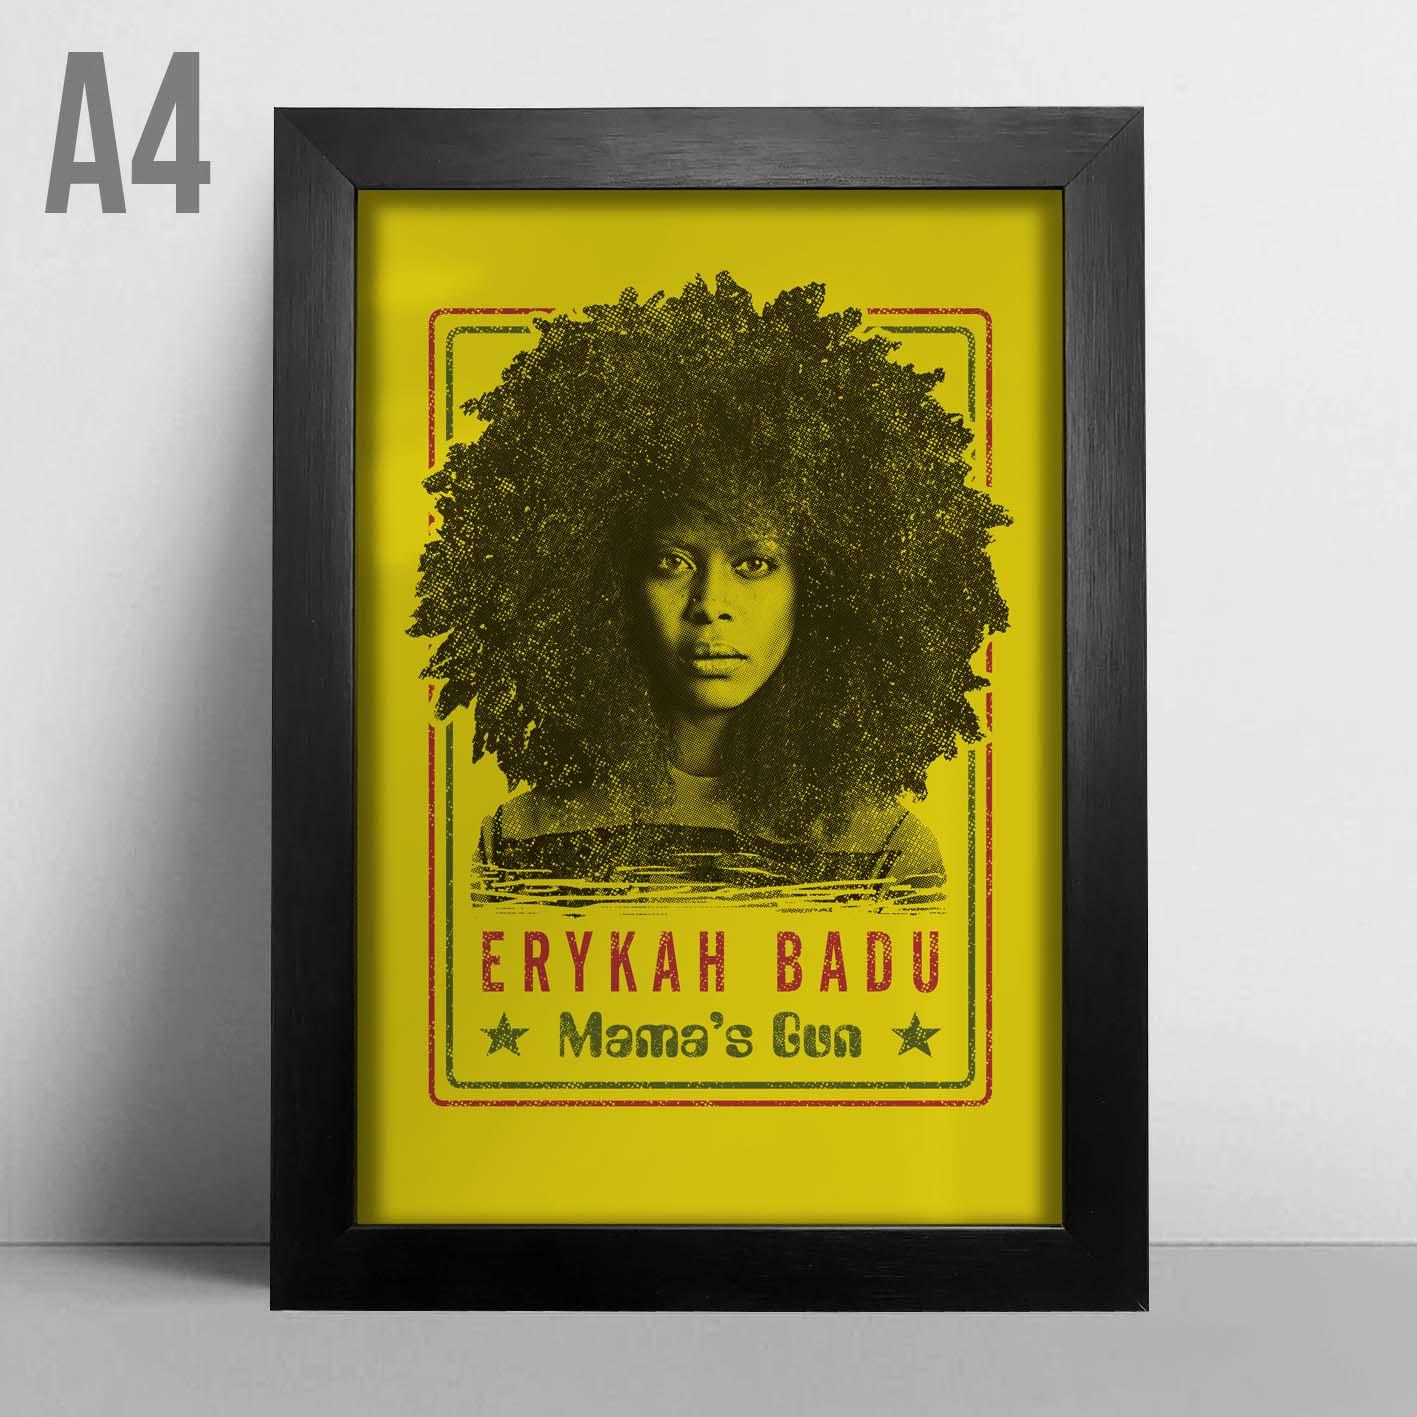 Quadro A4 - Erykah Badu